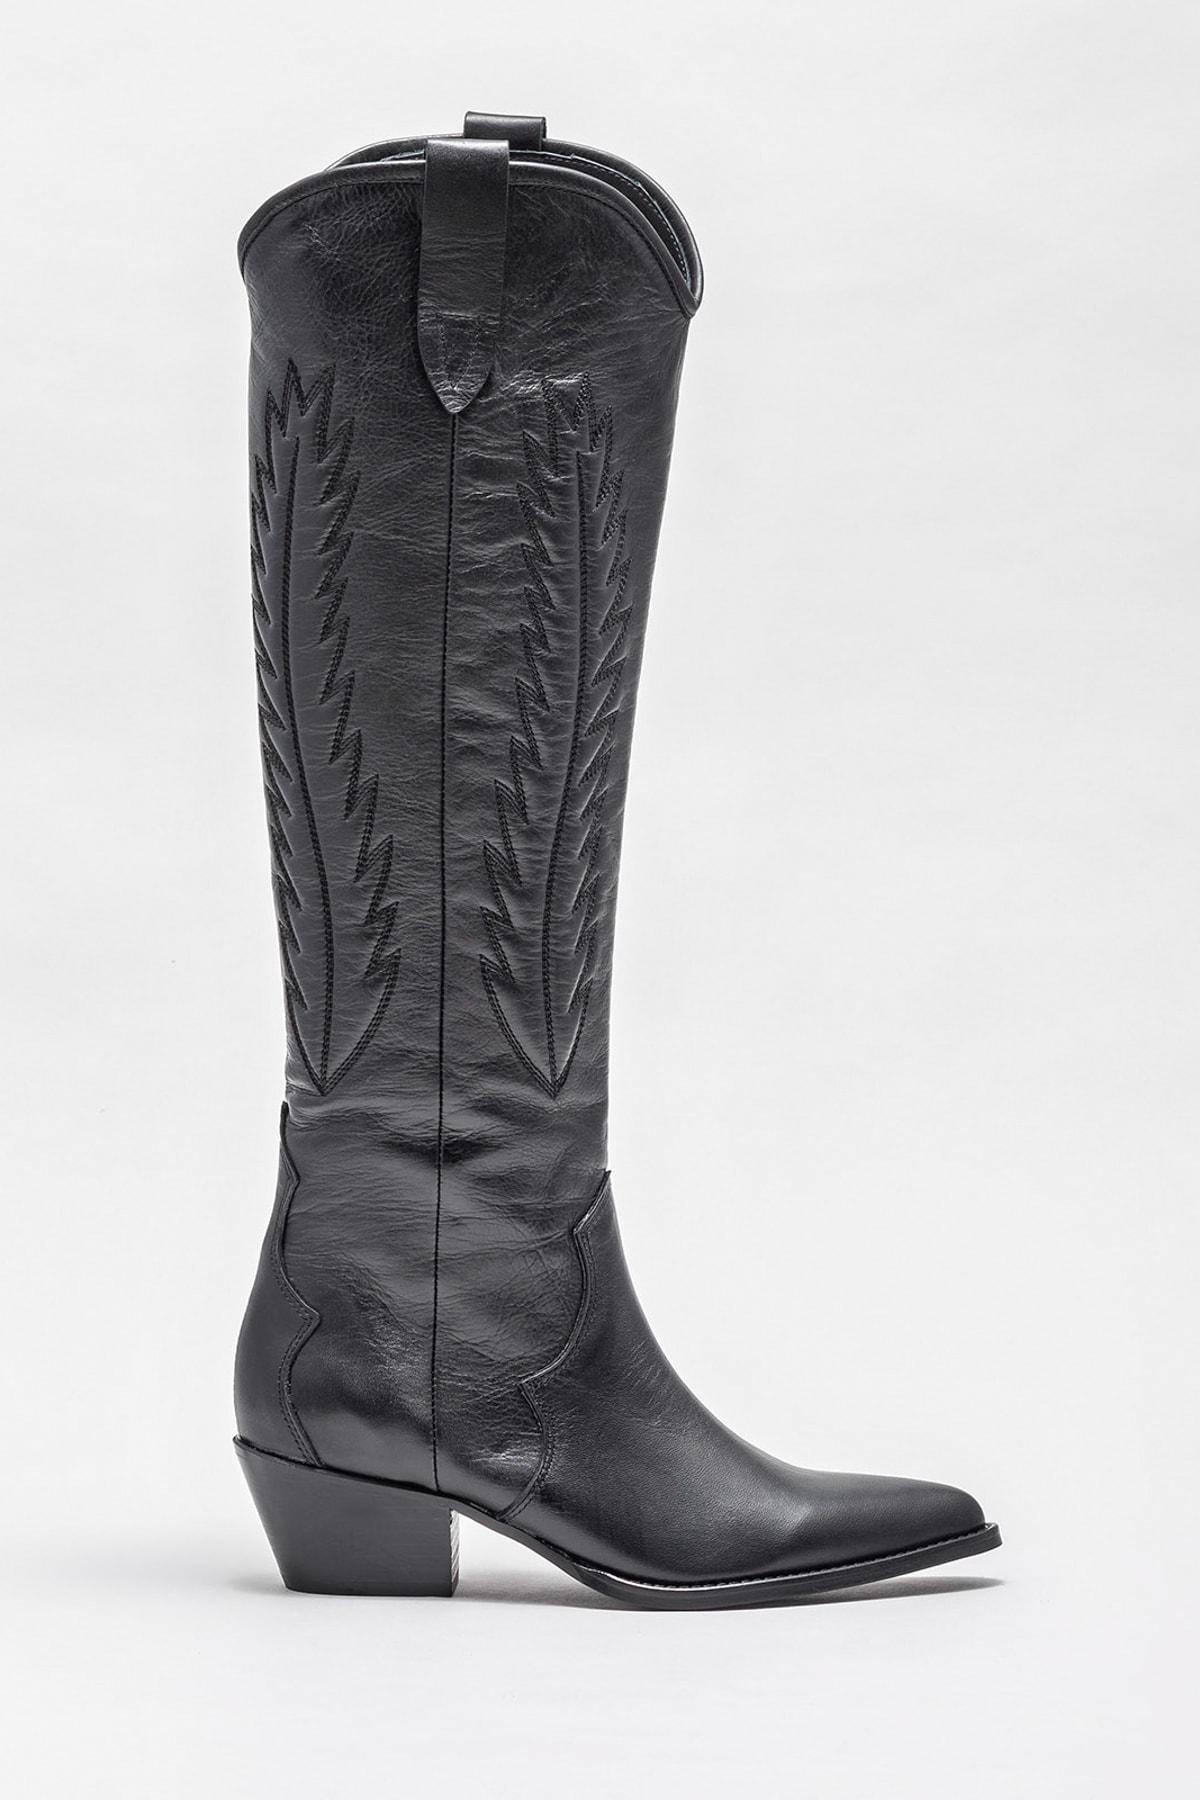 Elle Shoes Kadın COHAN-1 Çizme 20K045 1